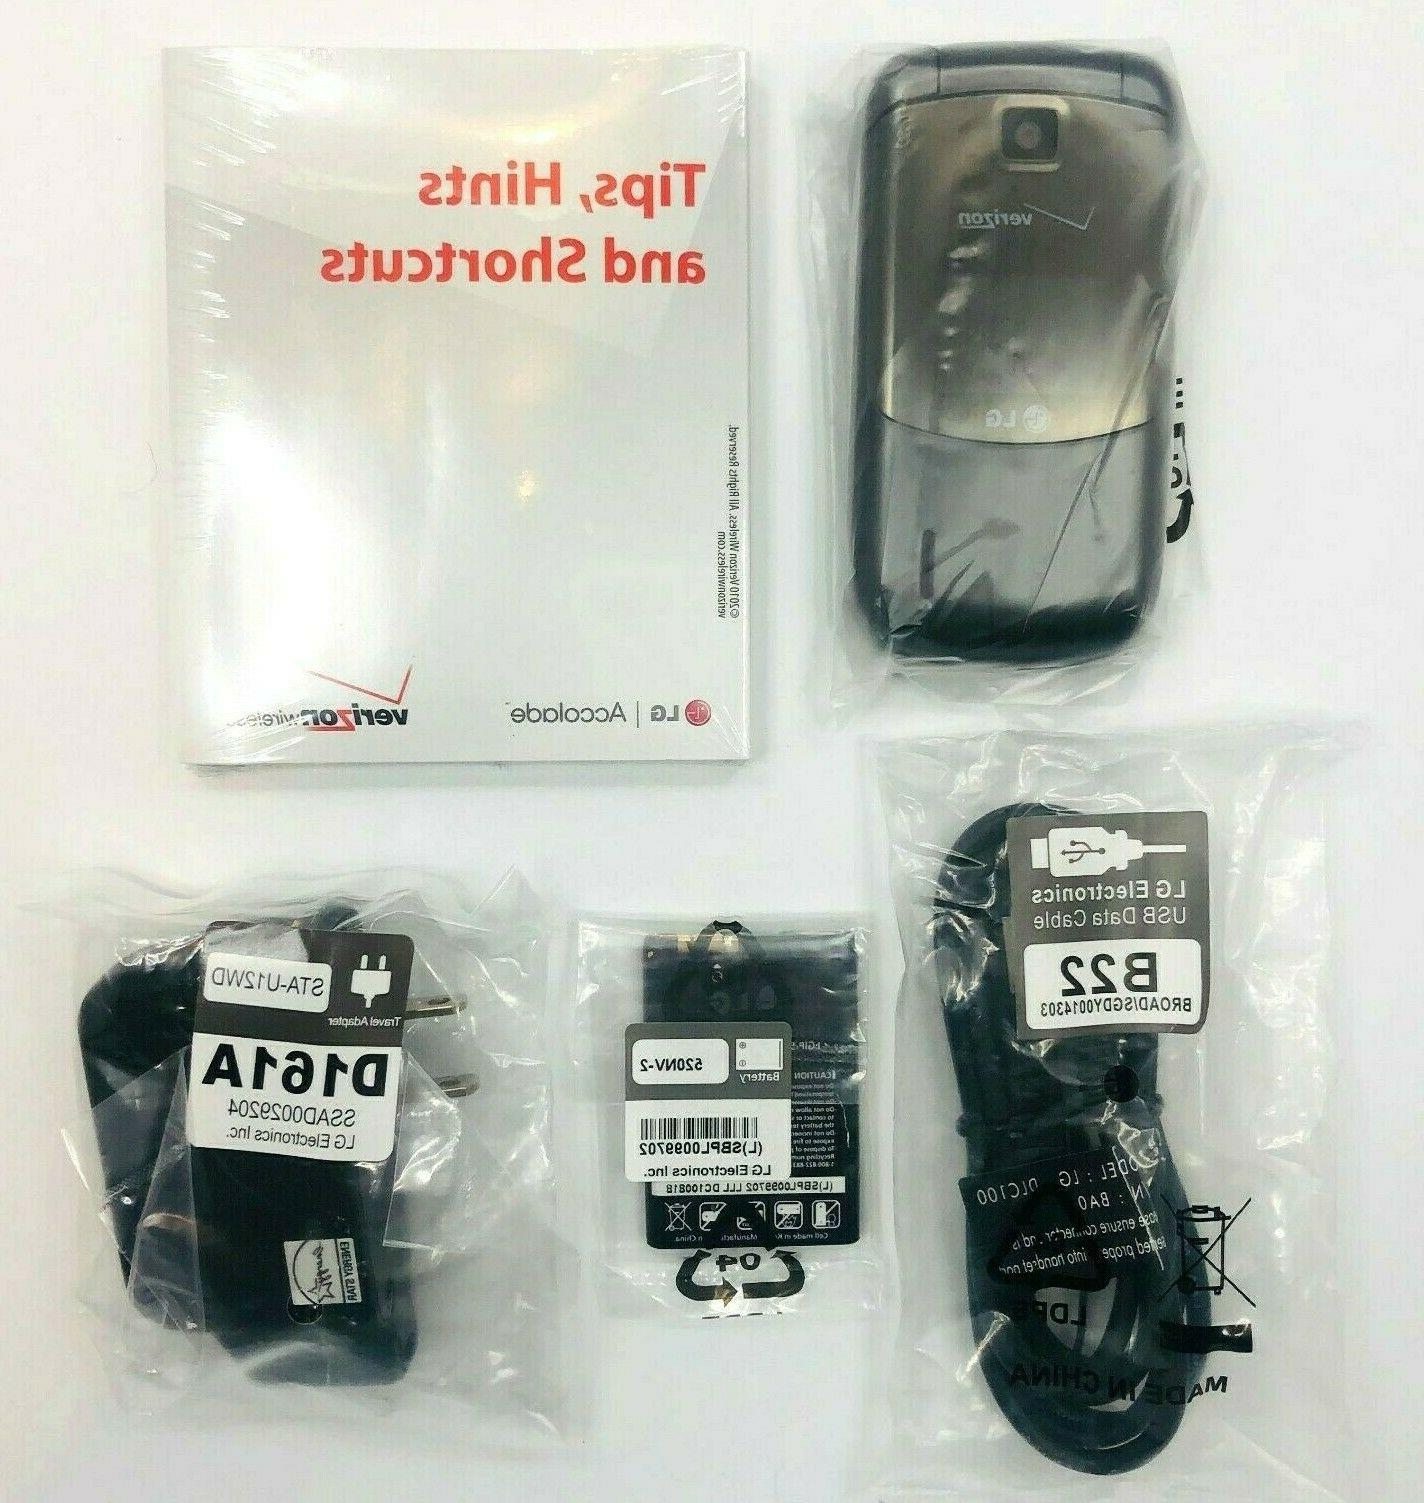 VX5600 3G Camera Cell Phone